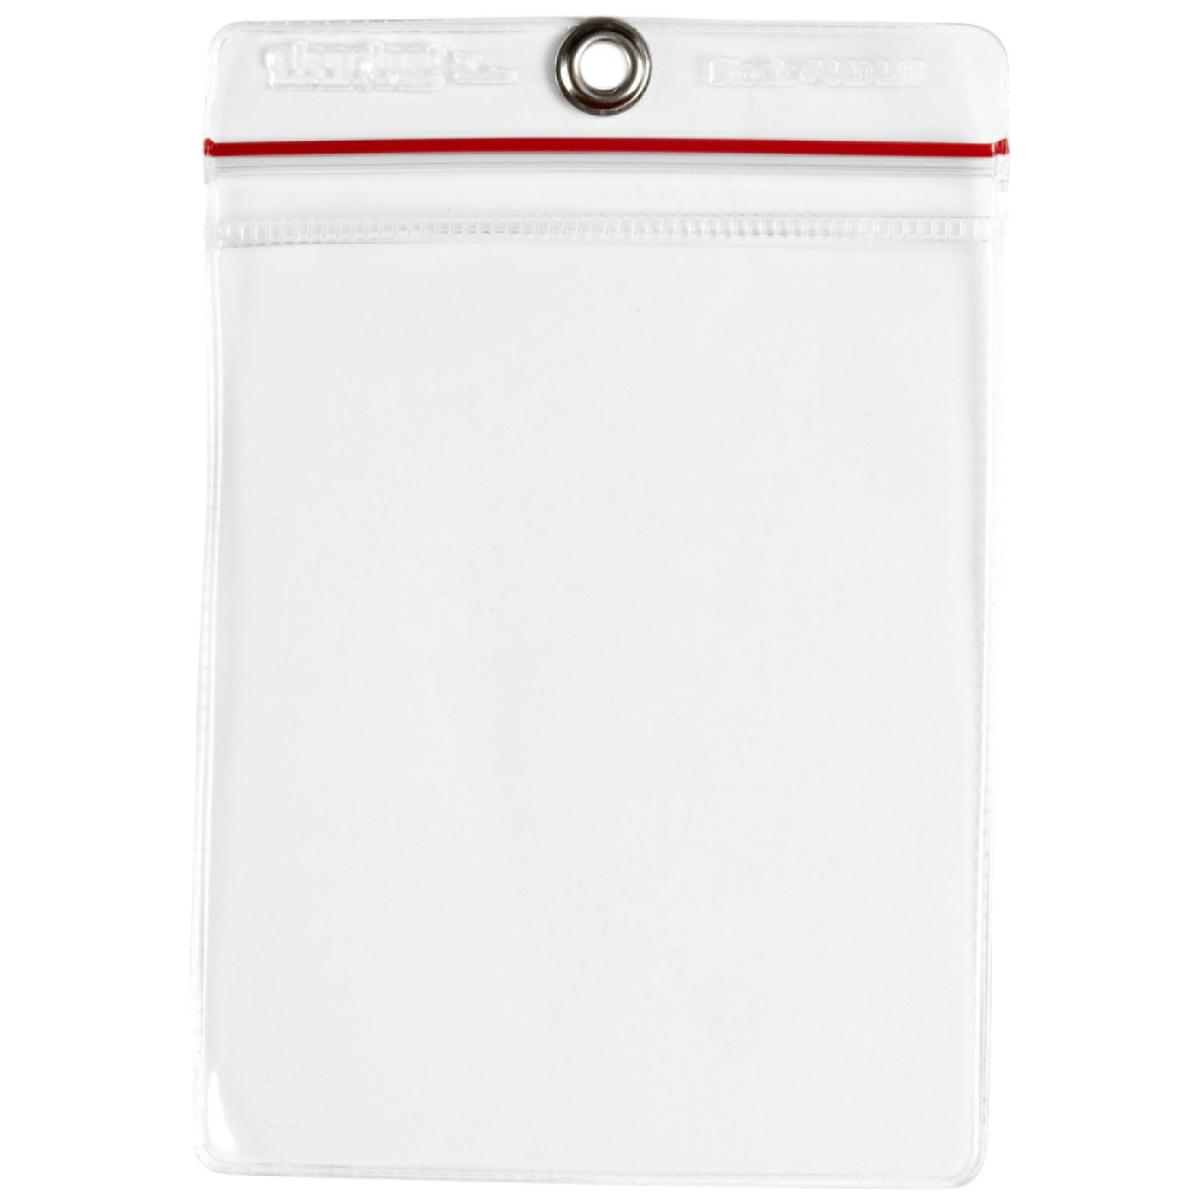 Brady® 81765 Protective Envelope With Grommet, Zip Lock Closure, 6-1/2 in H x 4-1/2 in W, Vinyl, Clear